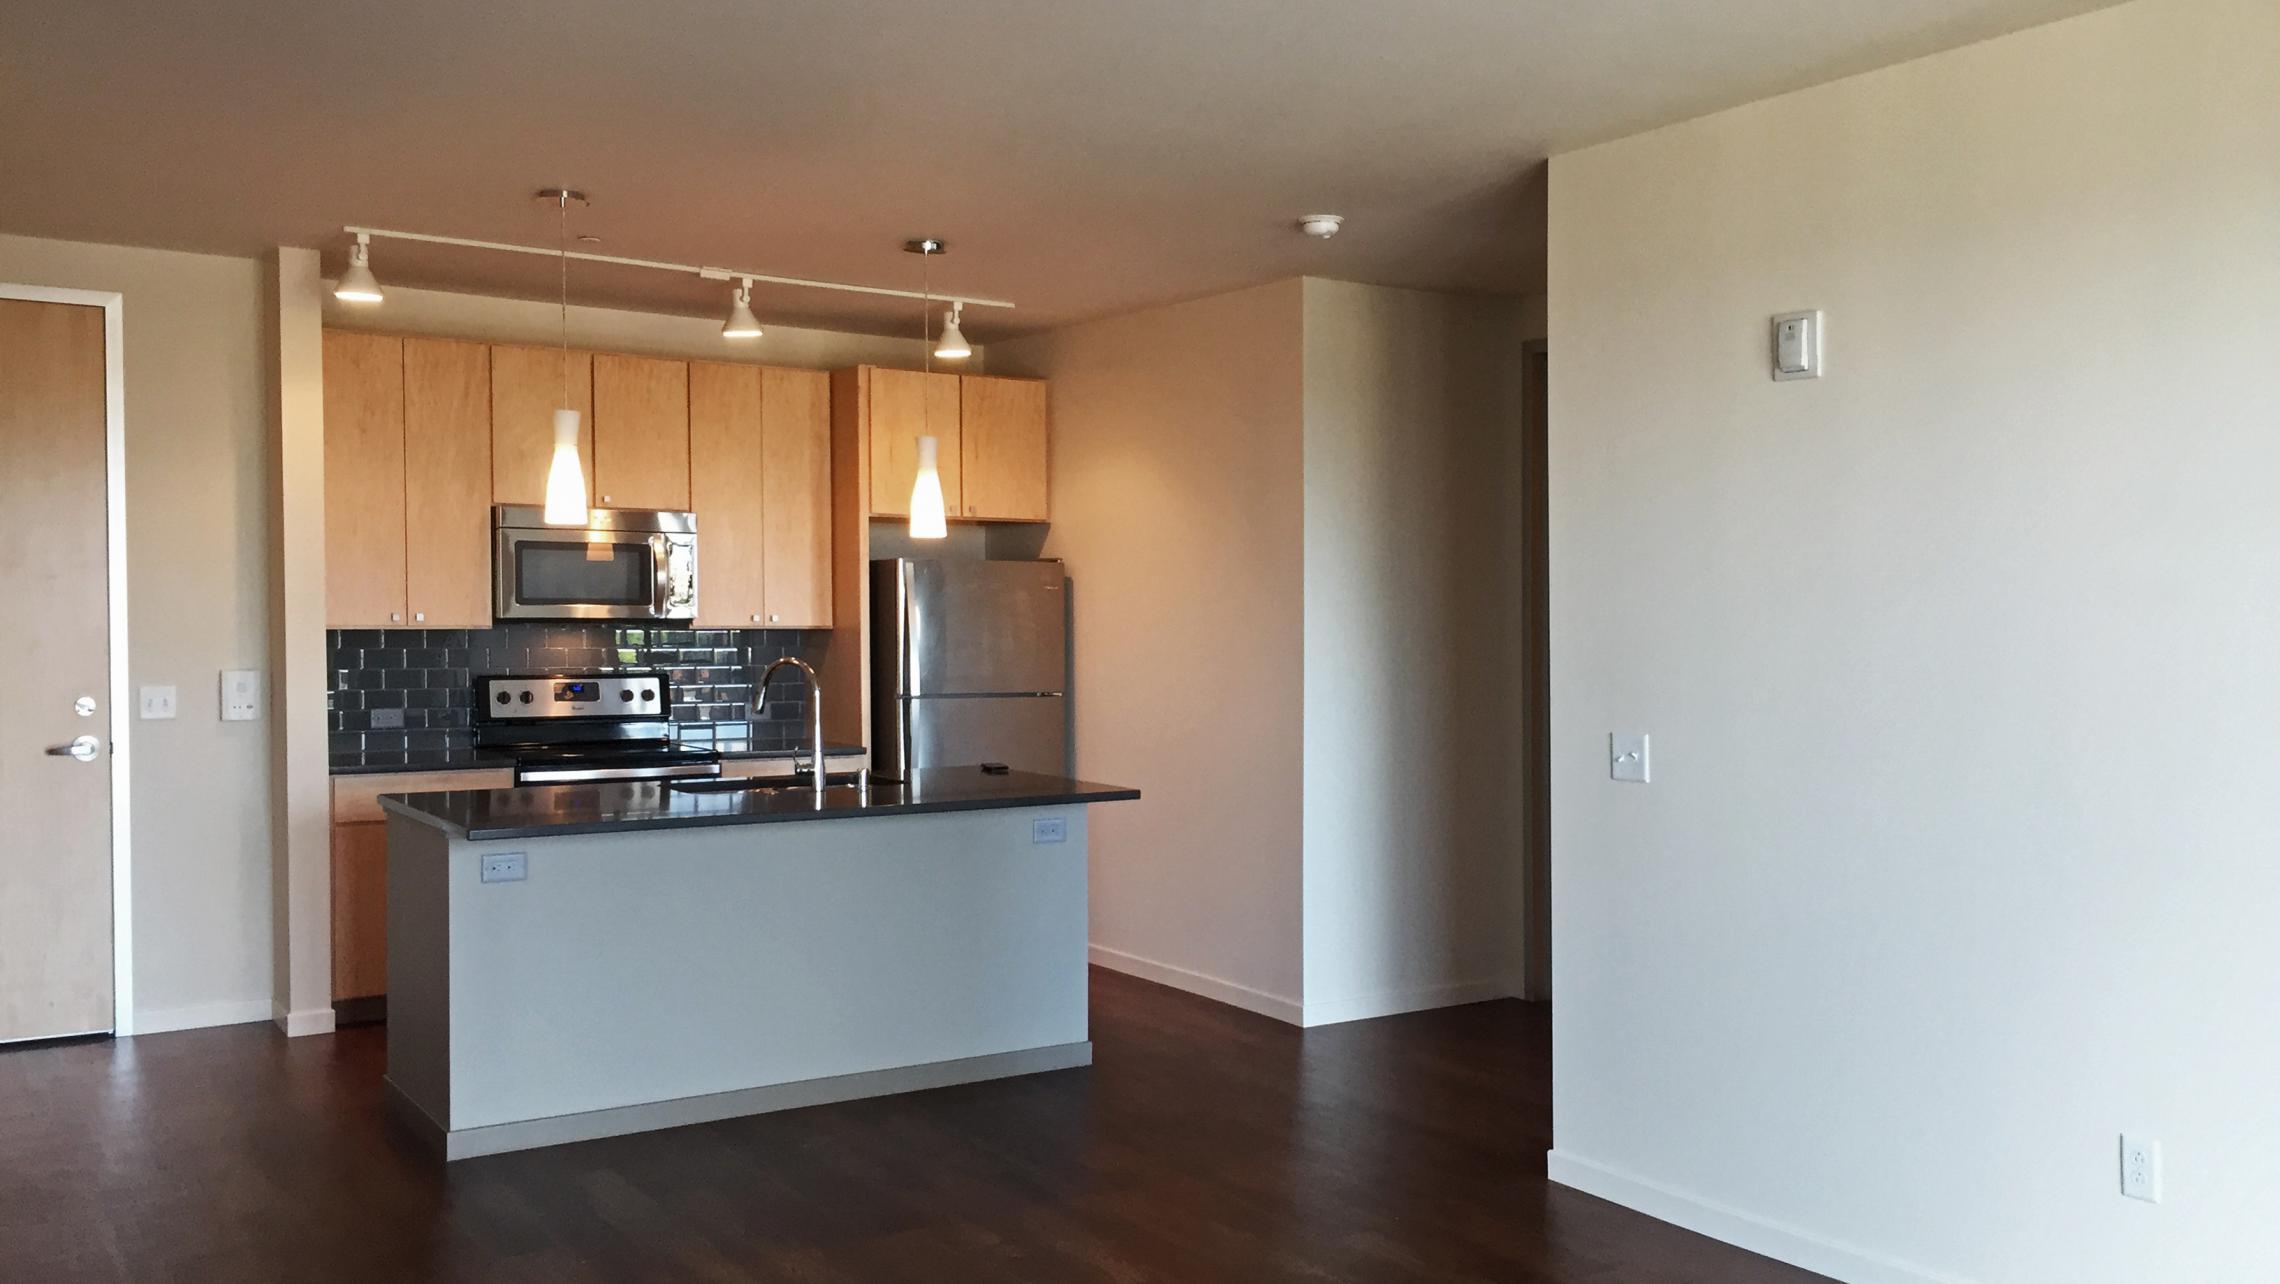 ULI Nine Line Apartment 218 - Kitchen and Living Area